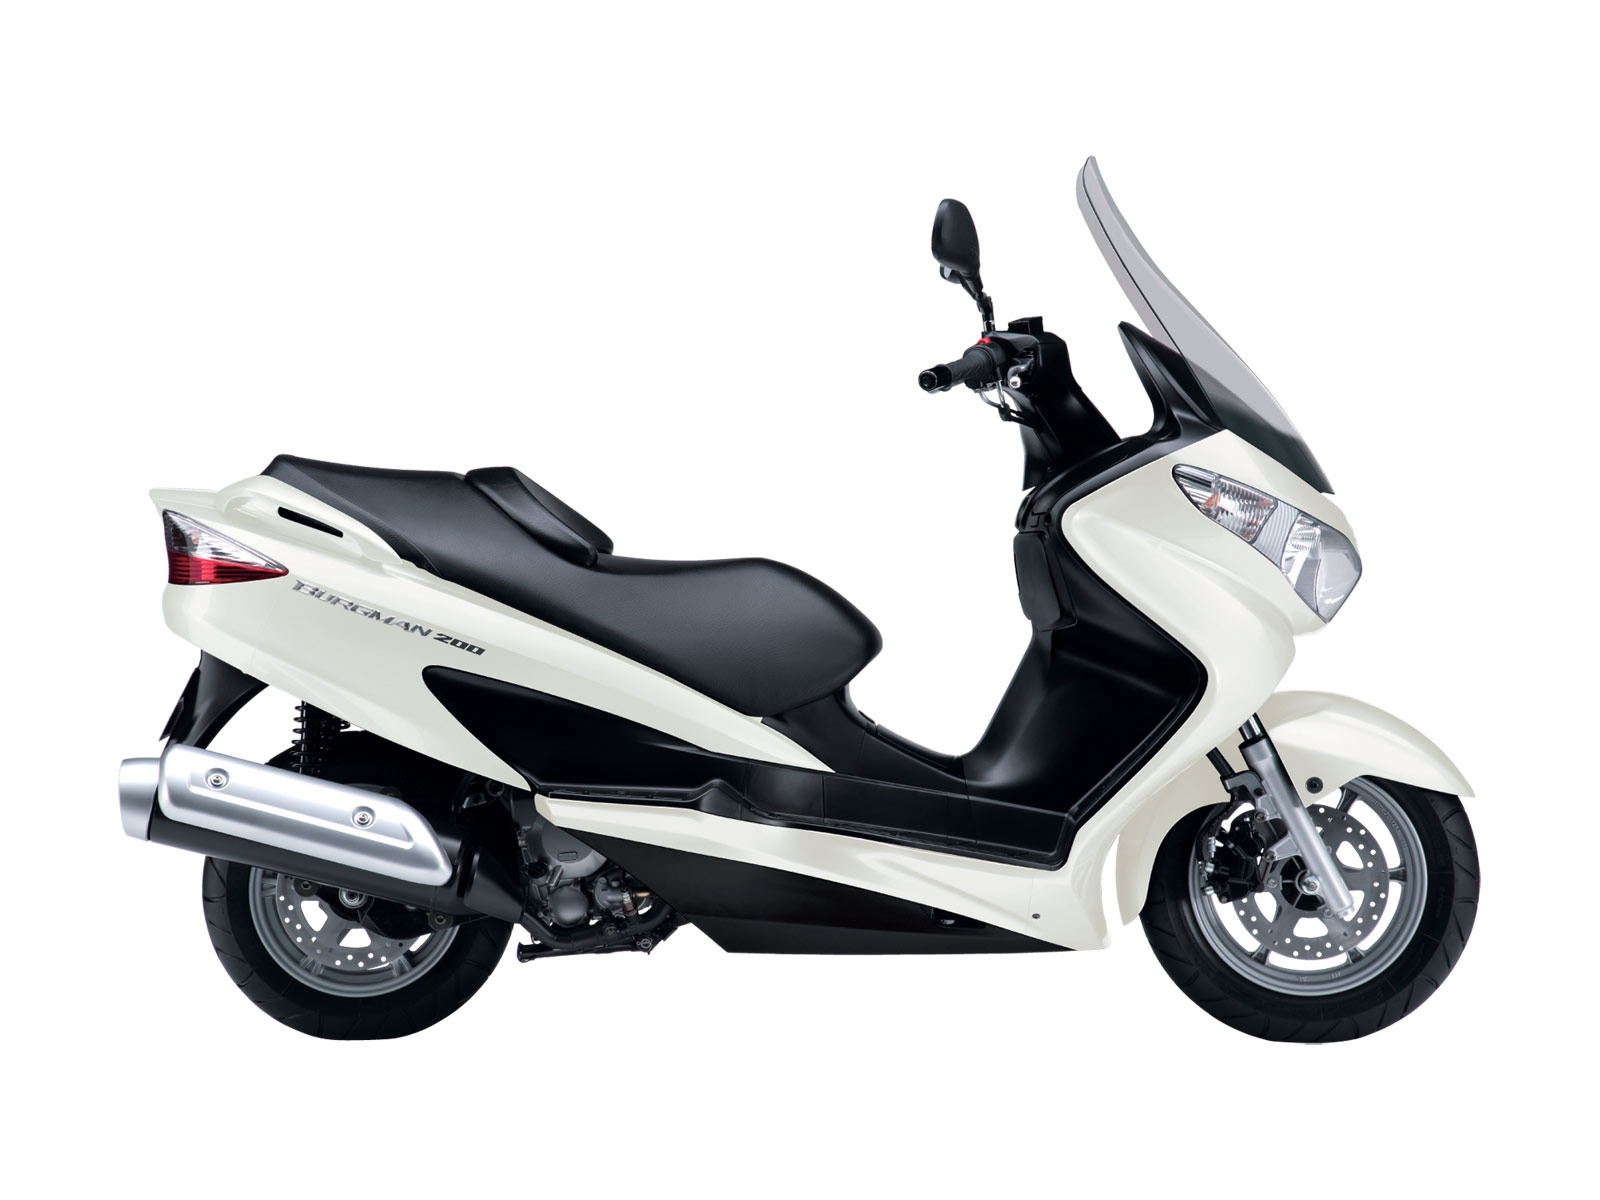 scooters mopeds 2012 suzuki burgman 200 scooter. Black Bedroom Furniture Sets. Home Design Ideas